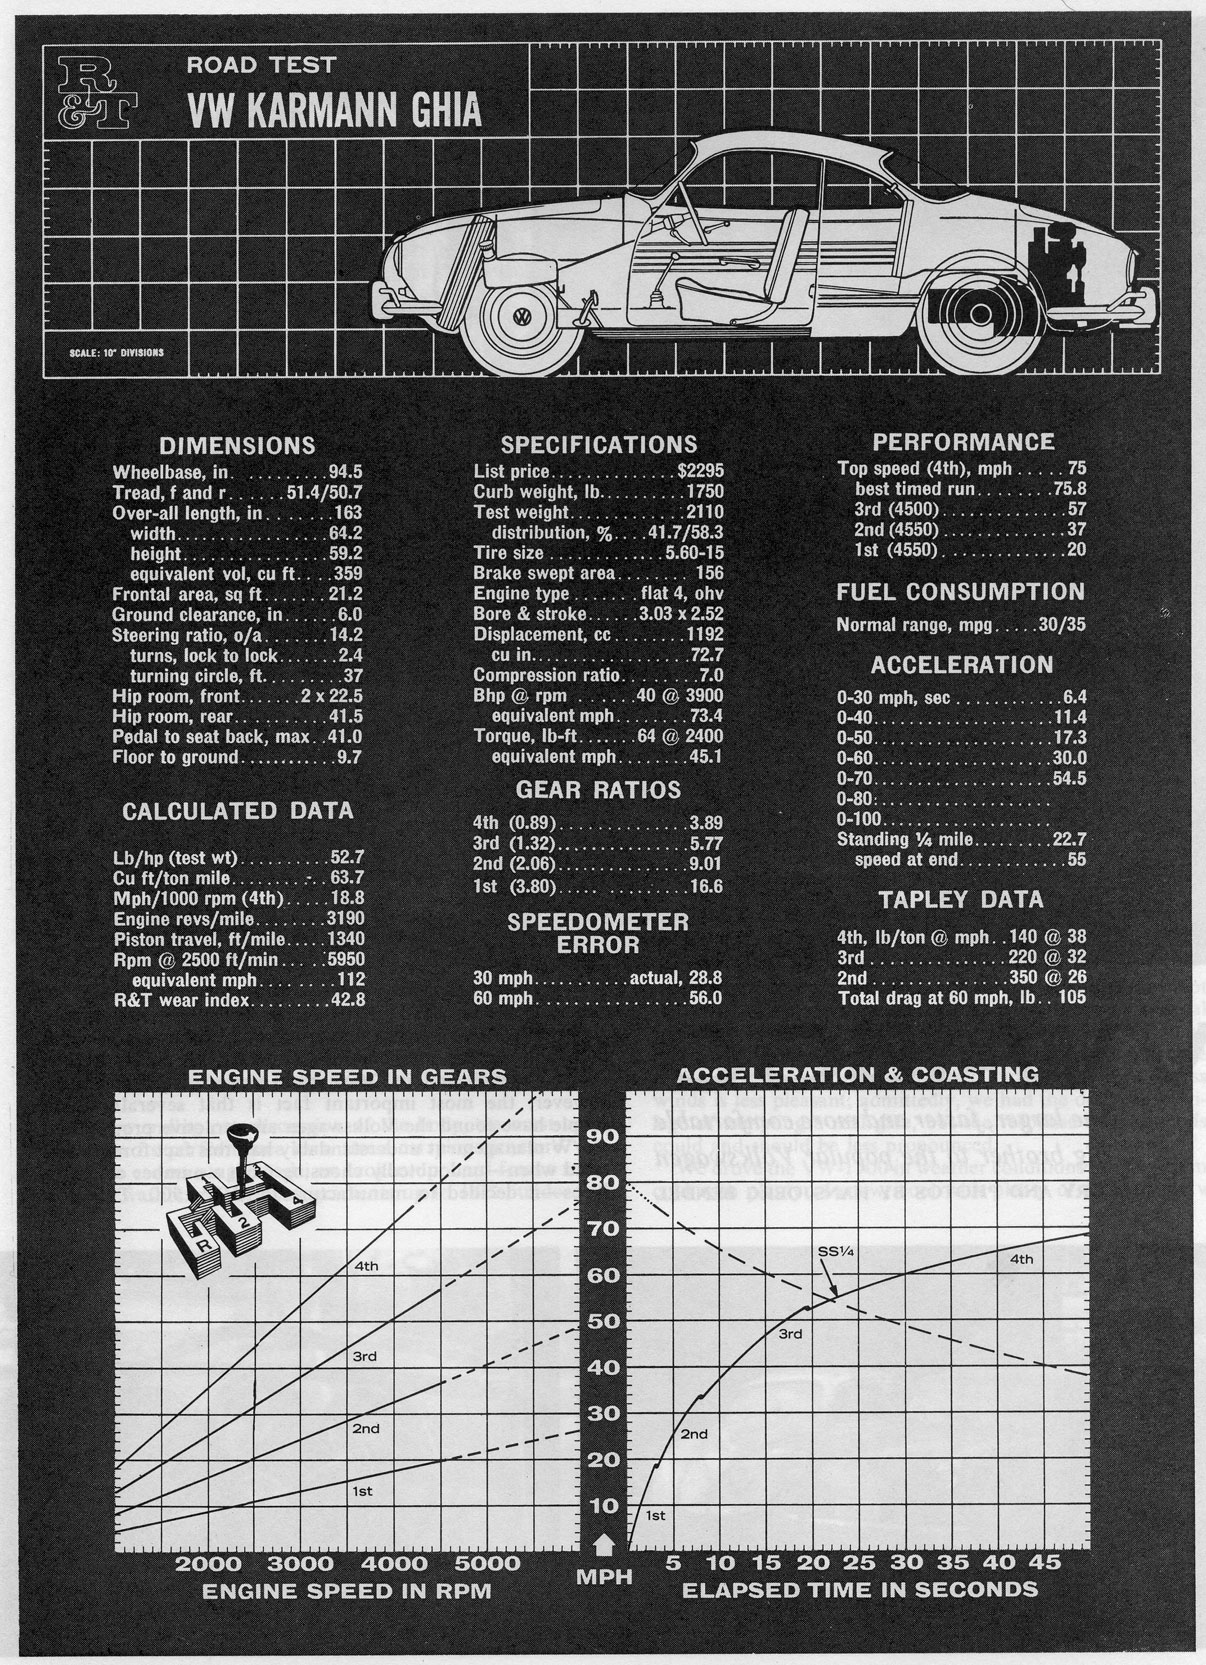 TheSamba VW Archives Road and Track Karmann Ghia